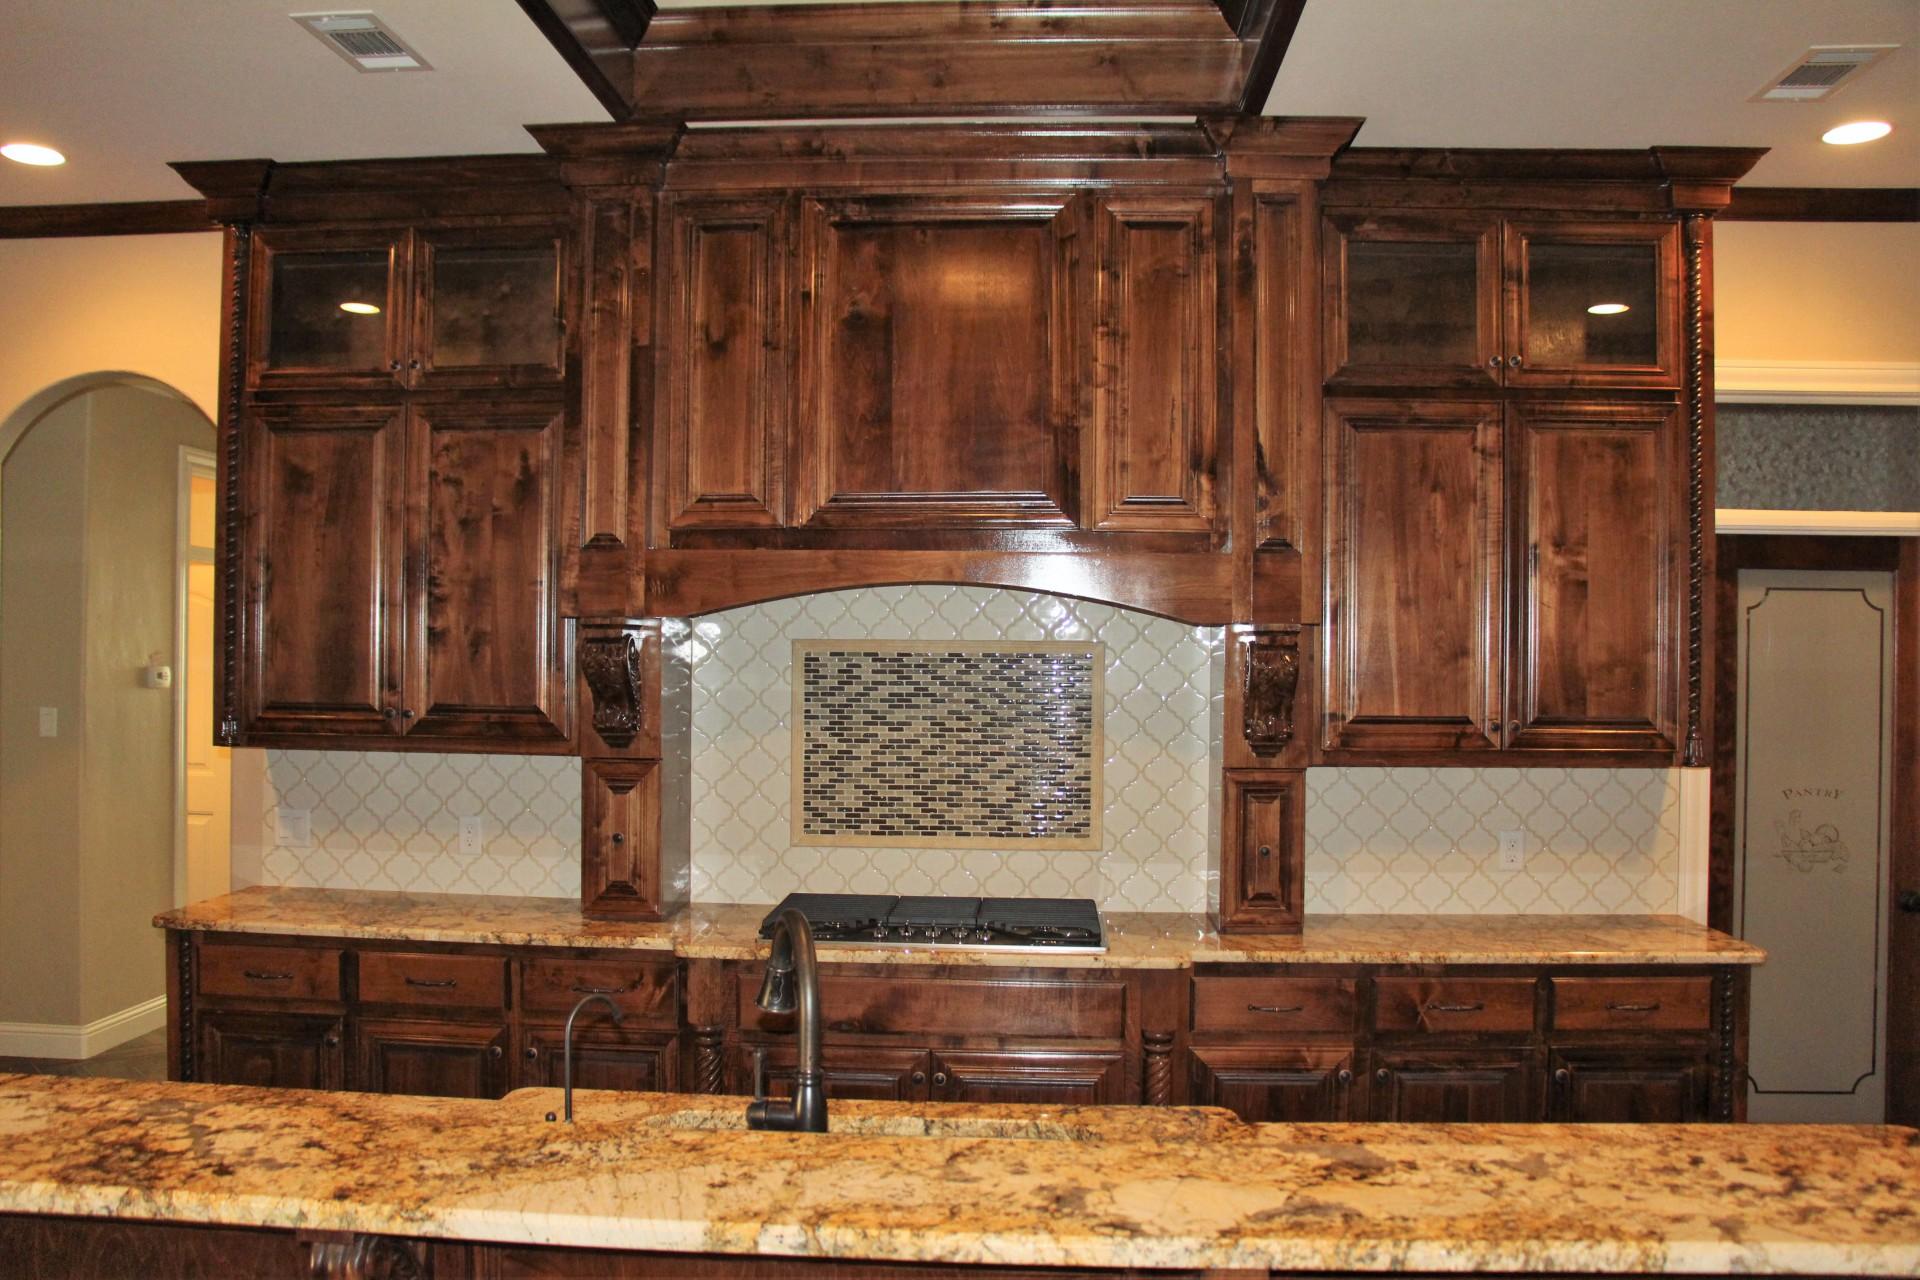 Kitchen Cabinets over range